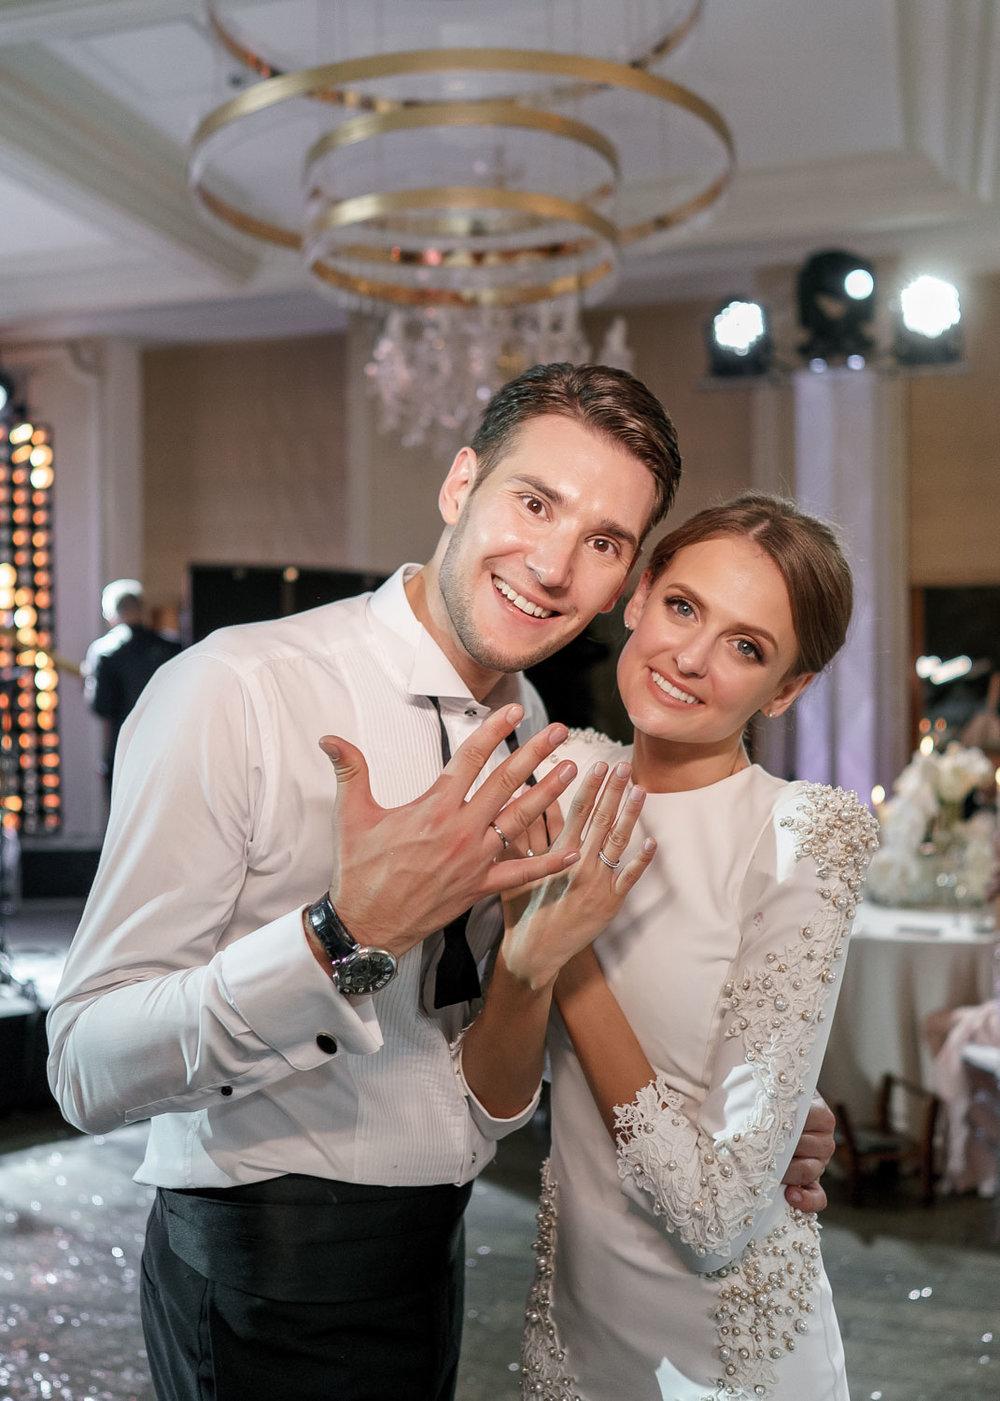 859 Olesya _ Sergey.jpg